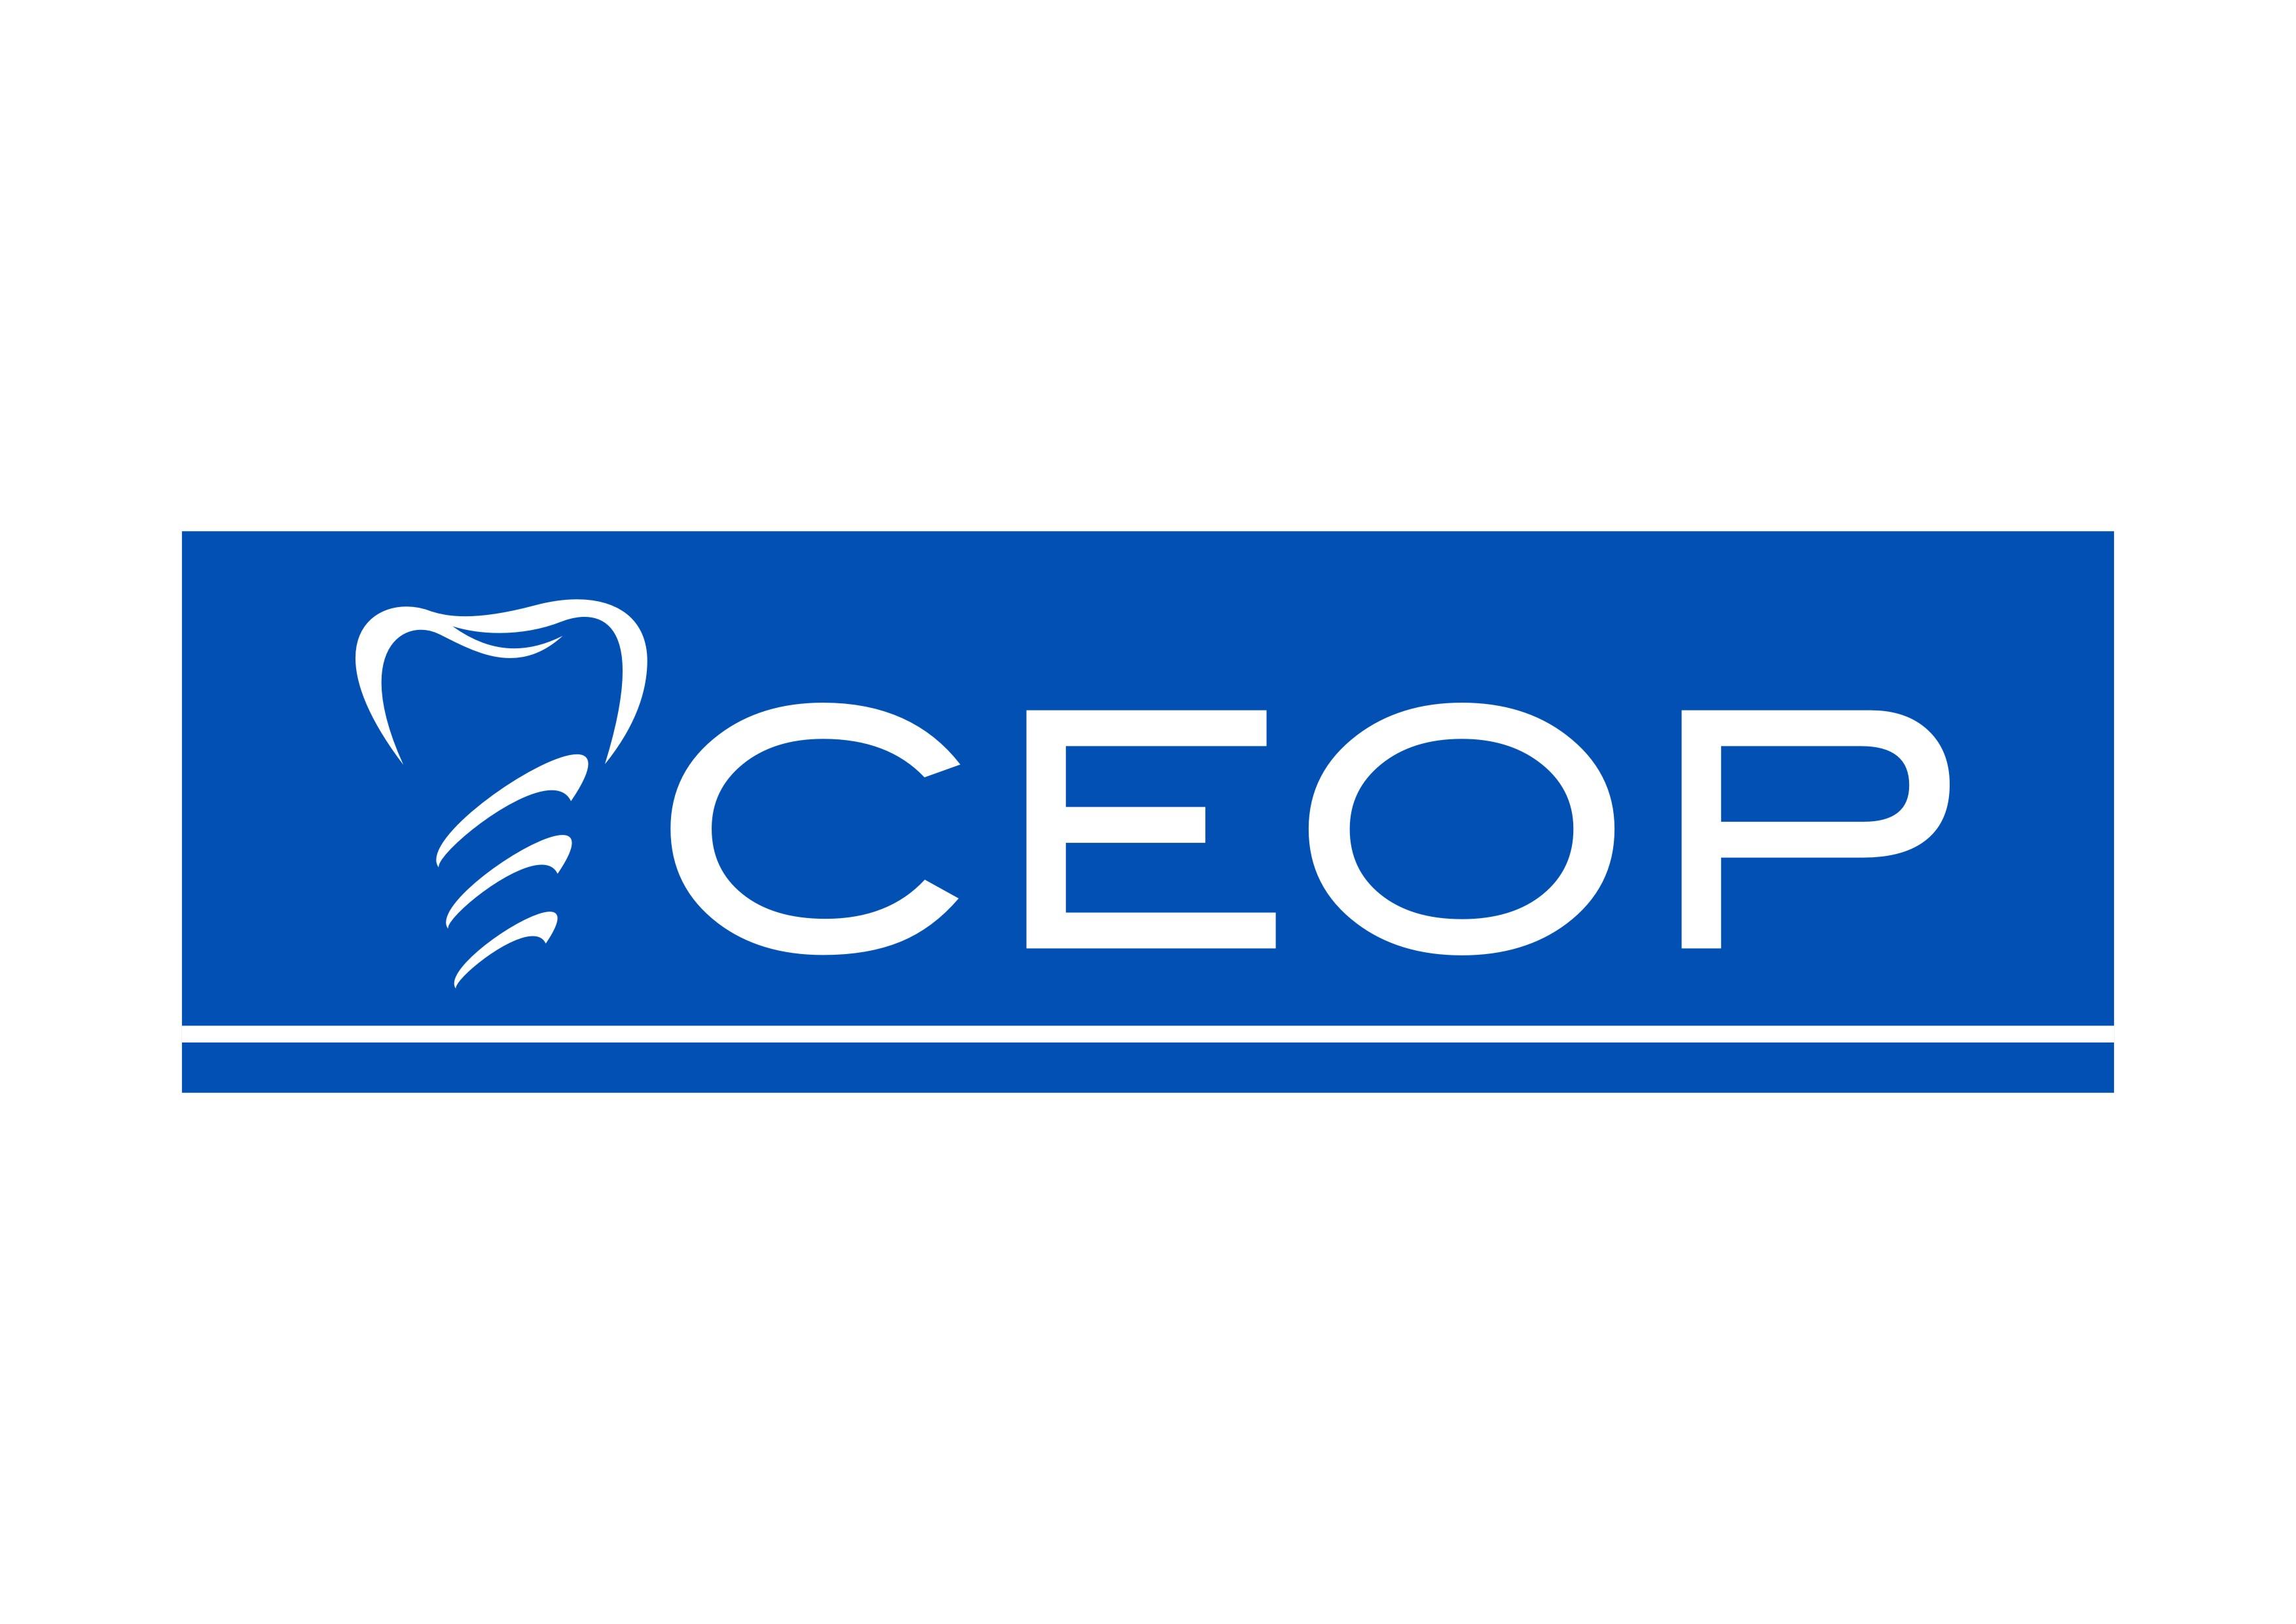 CEOP - Centro de Especialidades Odontológicas Premium